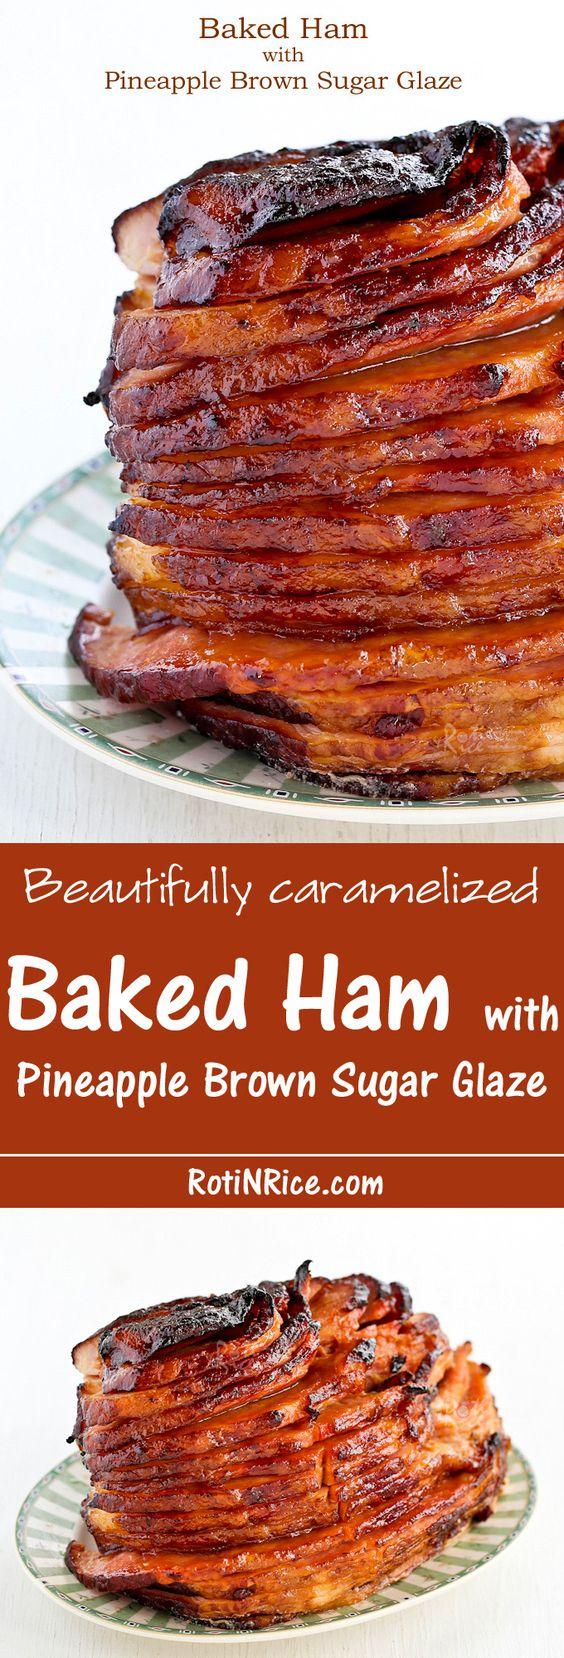 ... Brown-Sugar-Glaze-a-perfect-alternative-or-addition-to-the-Turkey-via